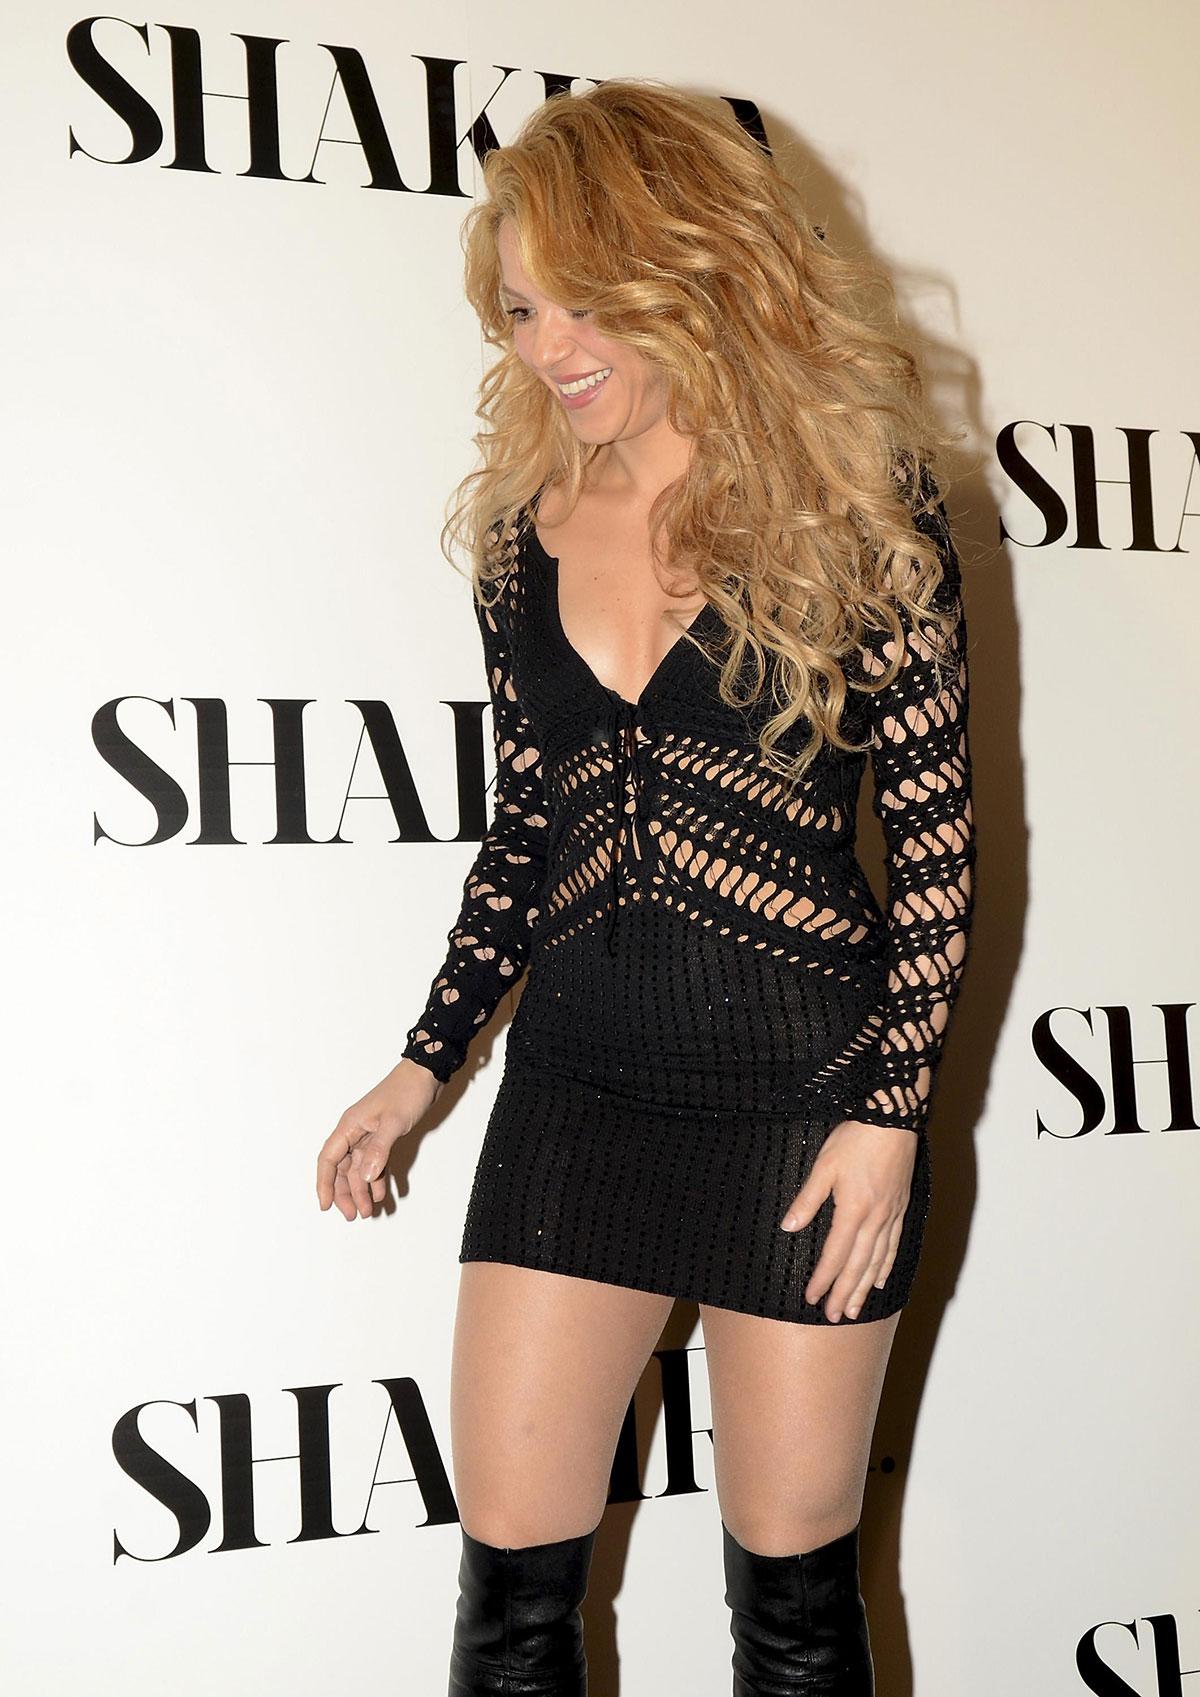 Shakira Photocall for her new album